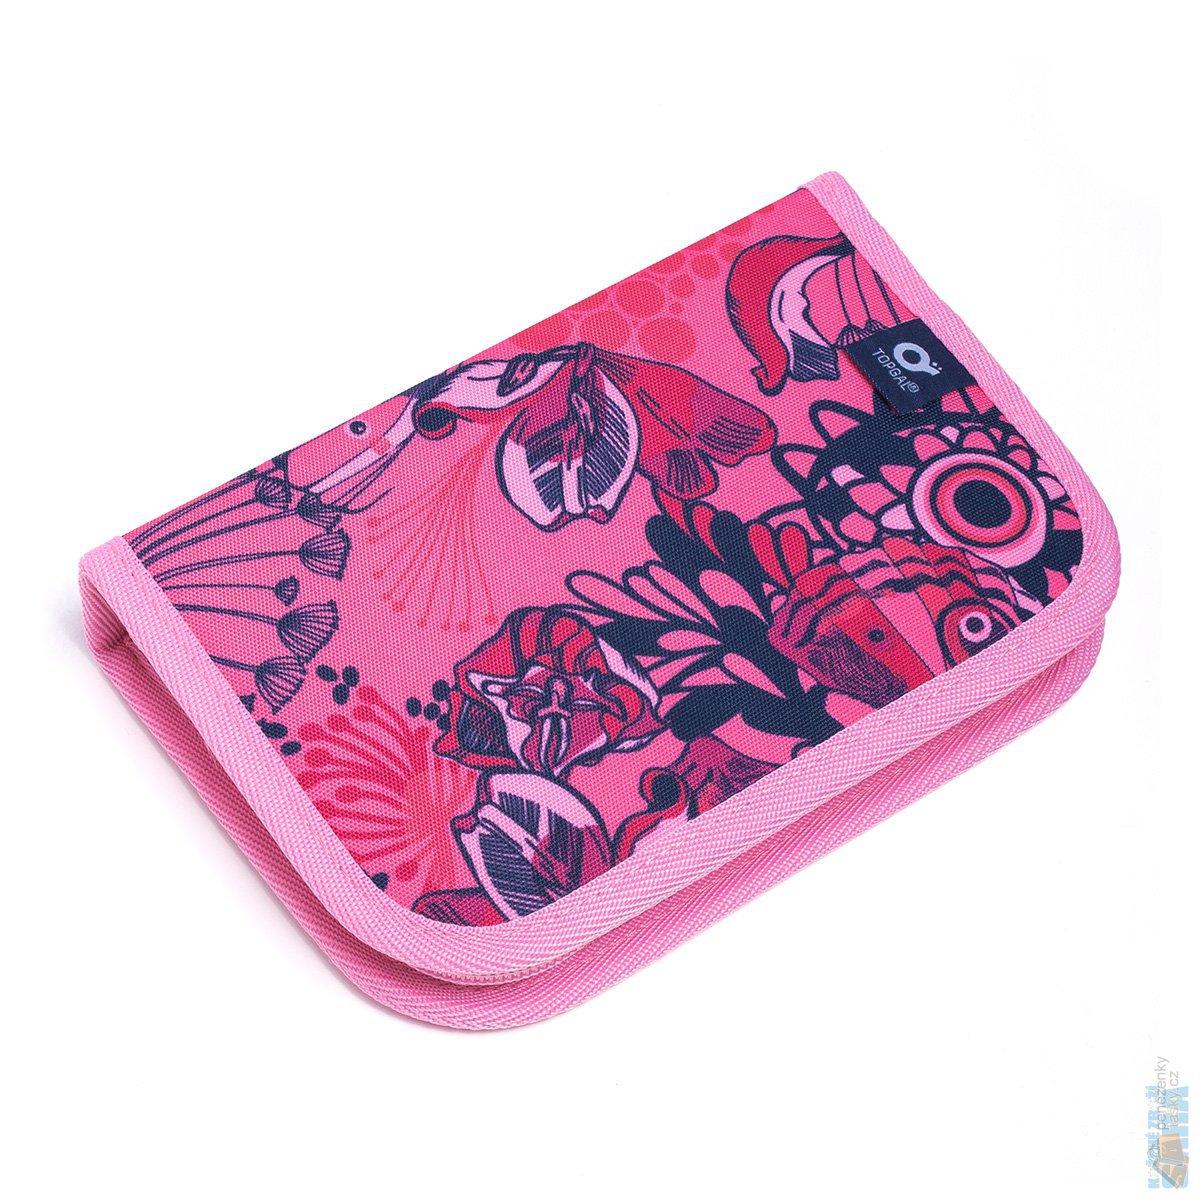 56727745d0f Topgal Sada pro školačku CHI 871 H pink SET large + penál CHI 899 H ...